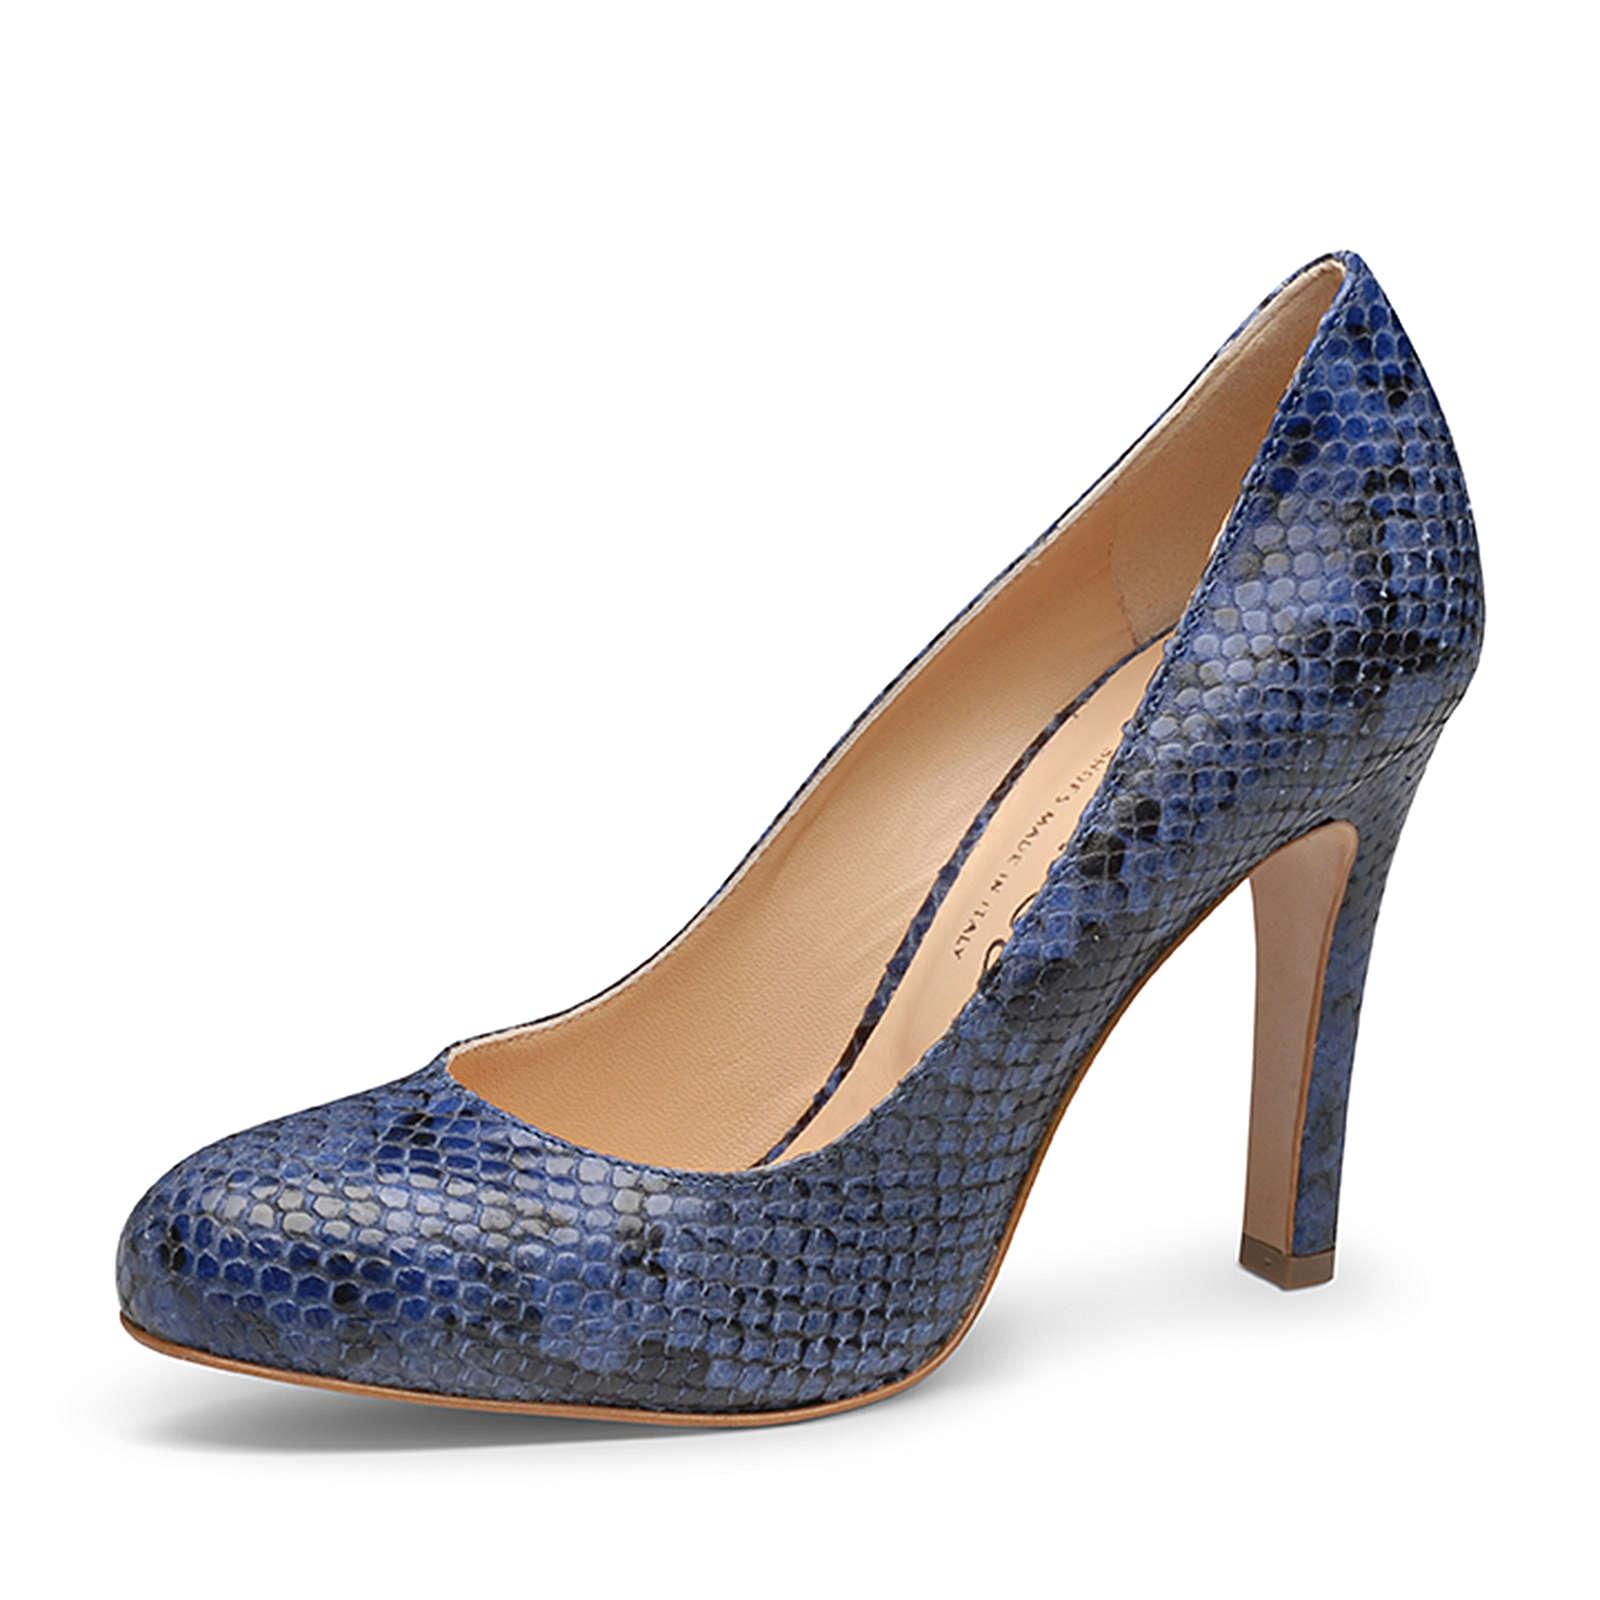 Evita Shoes Pumps dunkelblau Damen Gr. 34